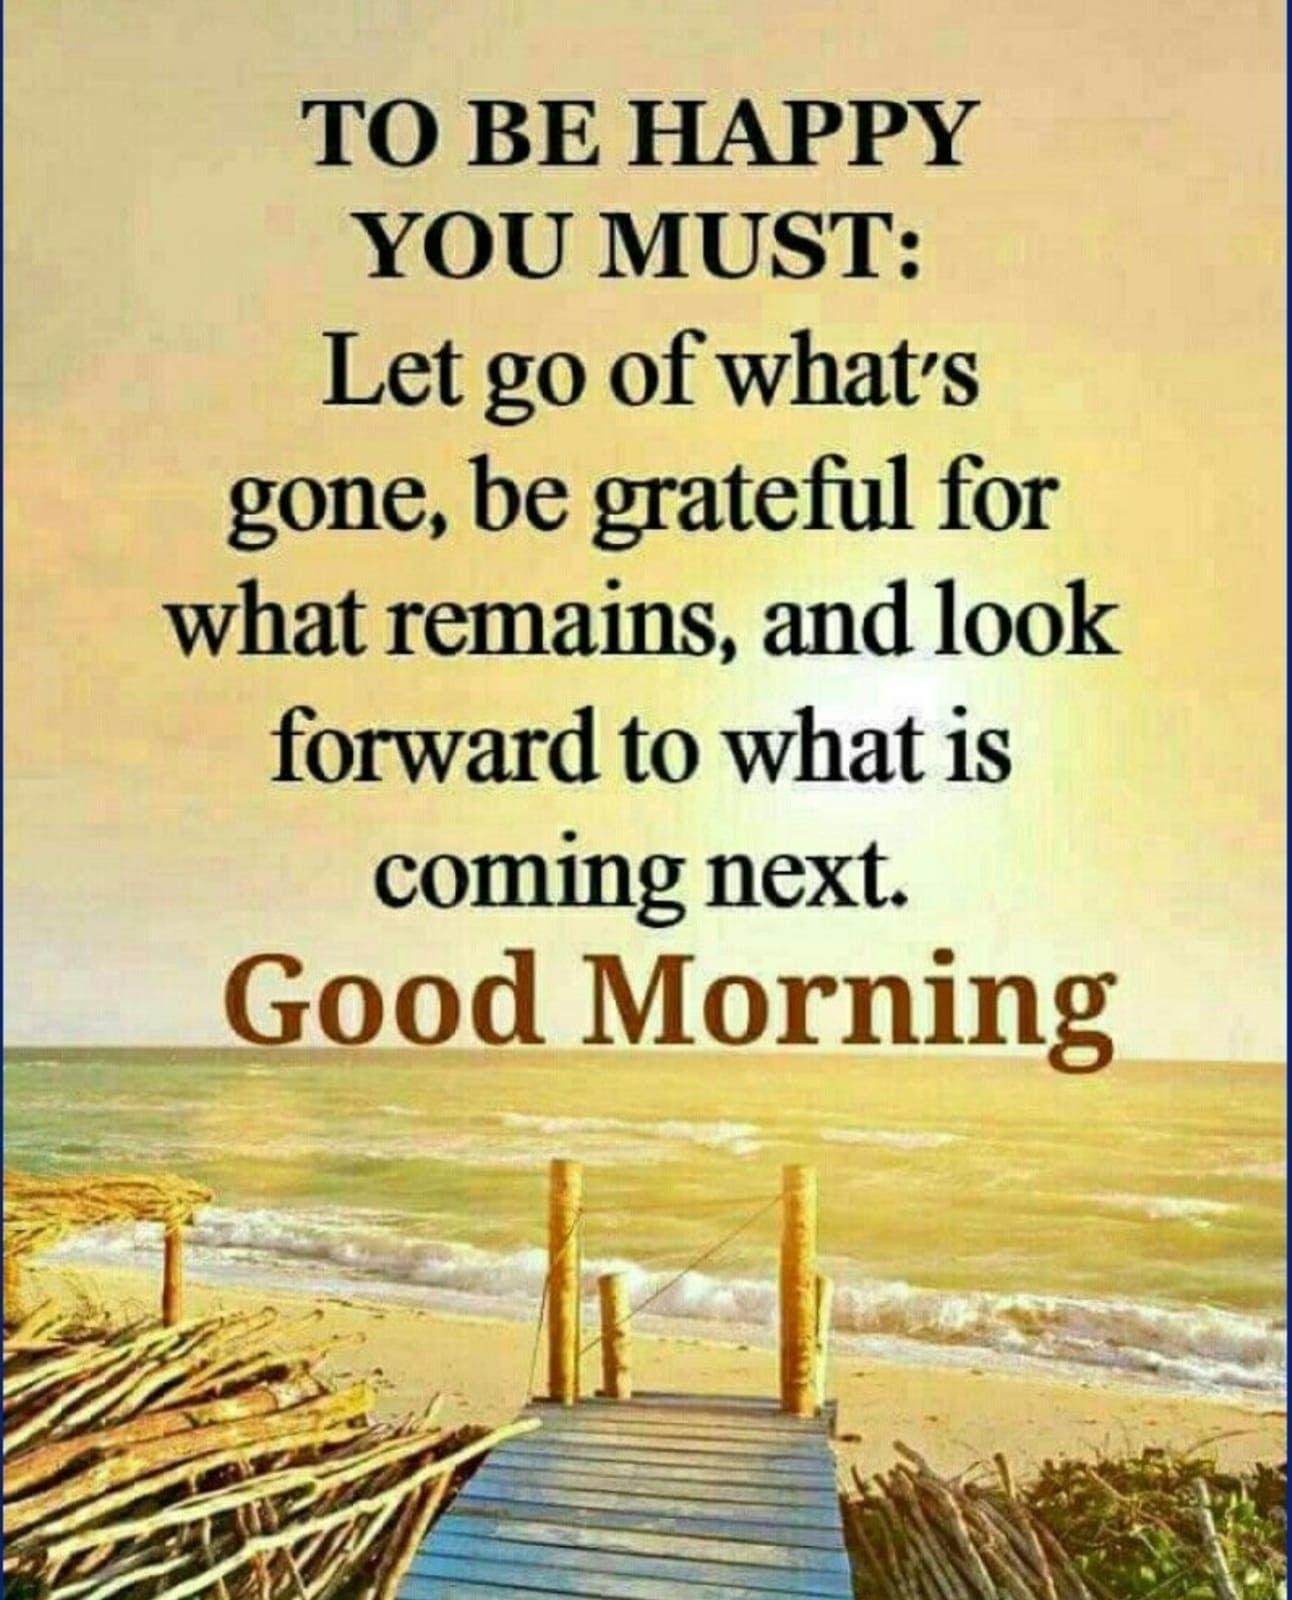 Good Morning Motivational Message Twitter thumbnail